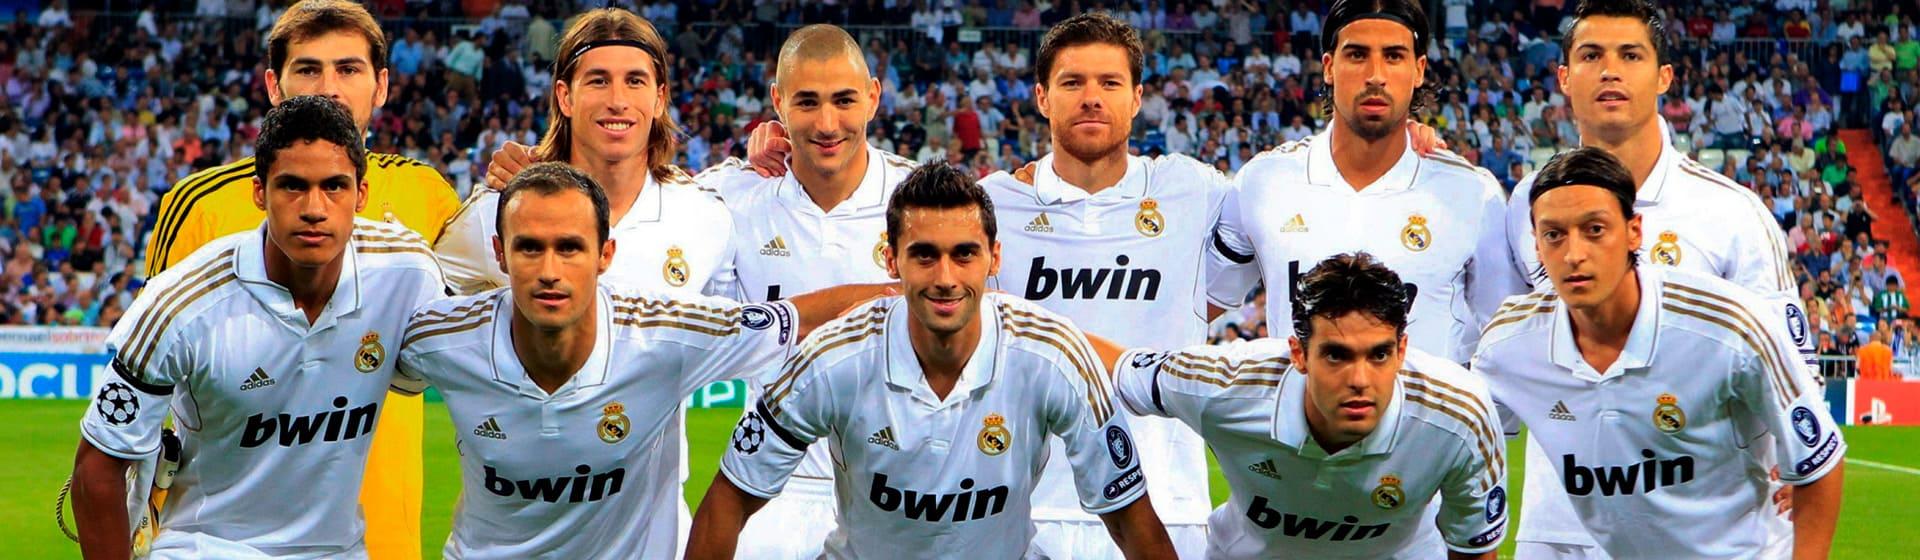 FC Real Madrid - Костюмы